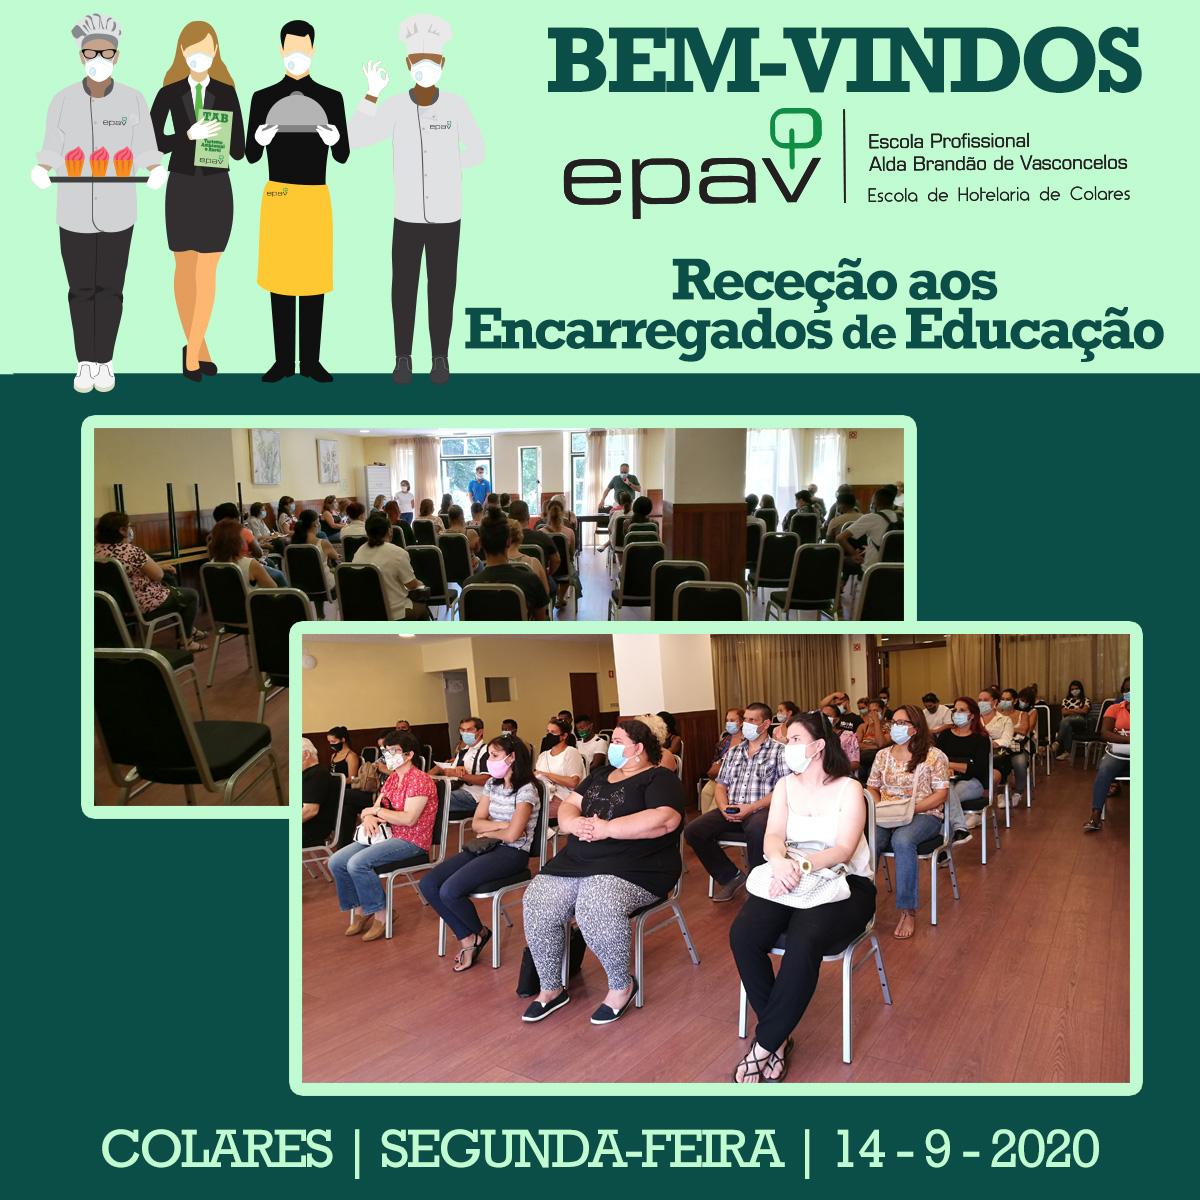 enc_educ2020_1dia_aulas